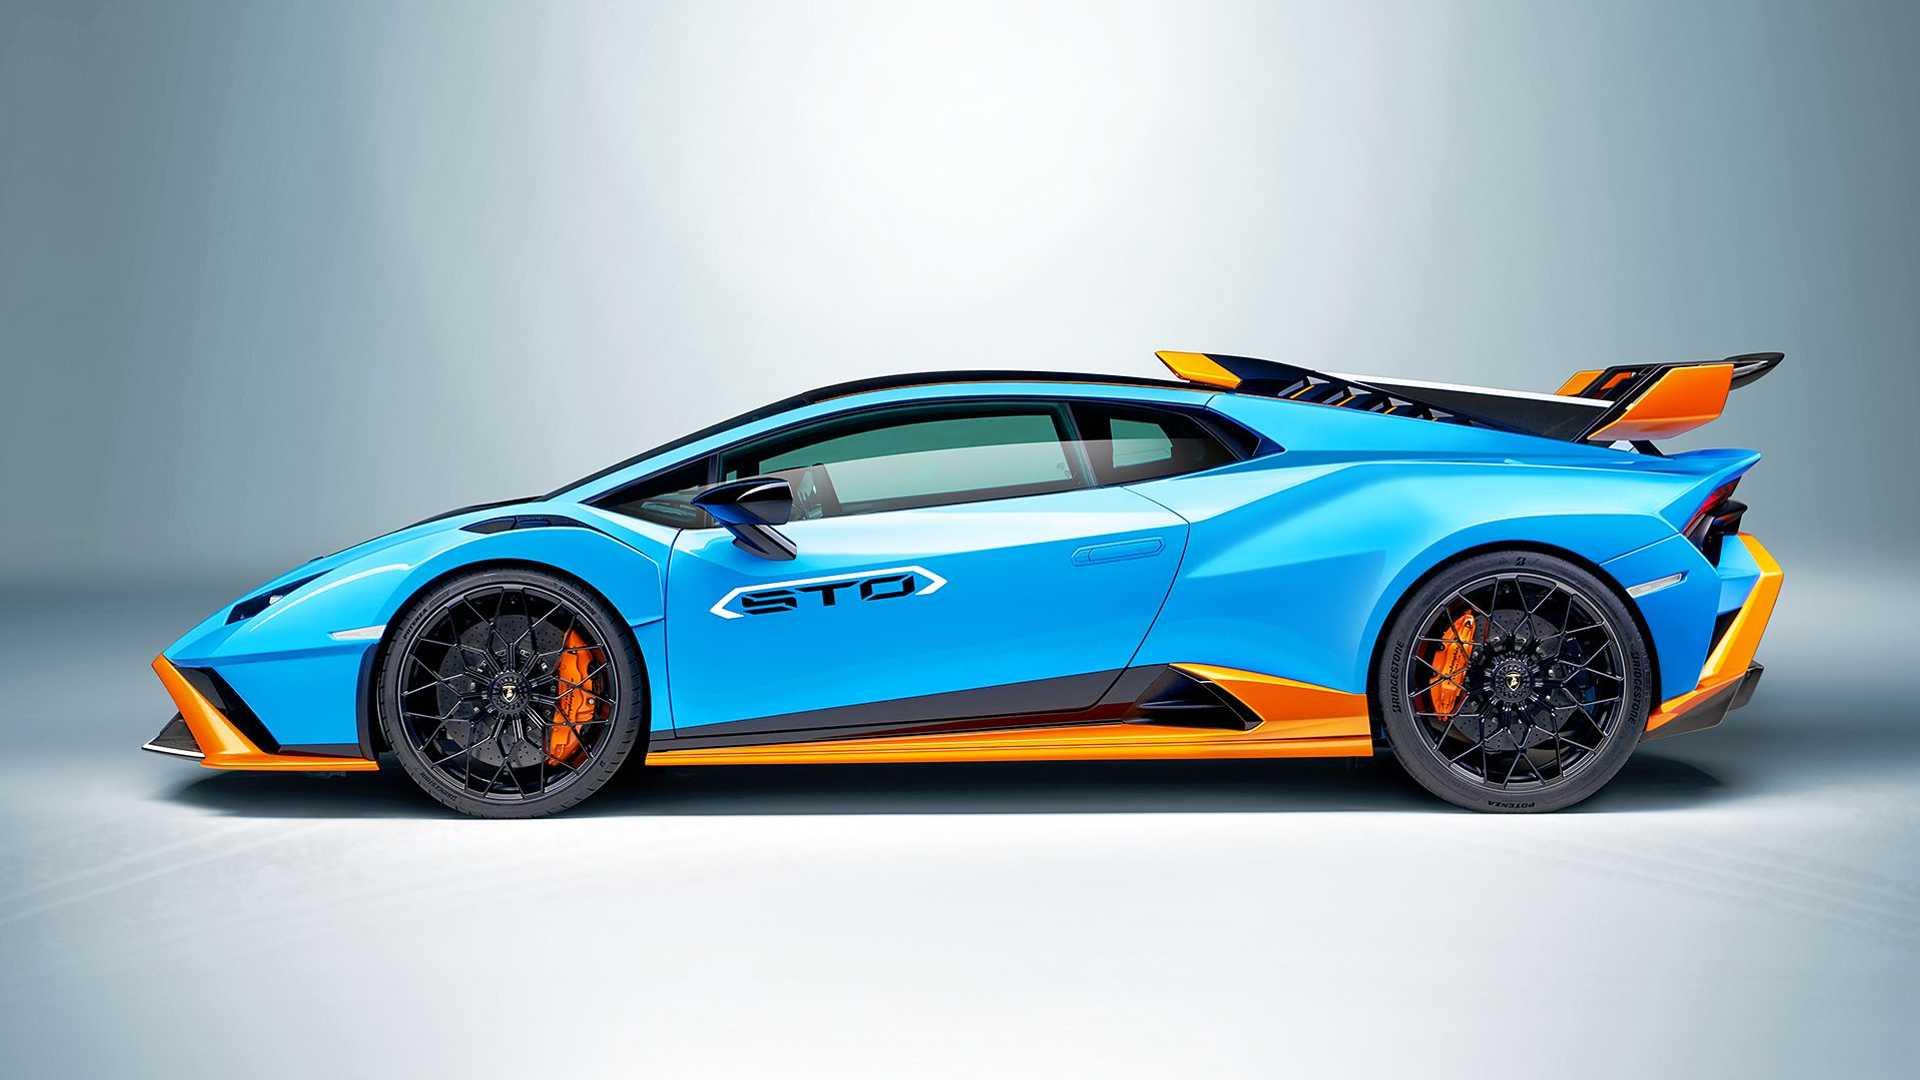 Superauto Lamborghini Huracan STO z homologacja drogowa